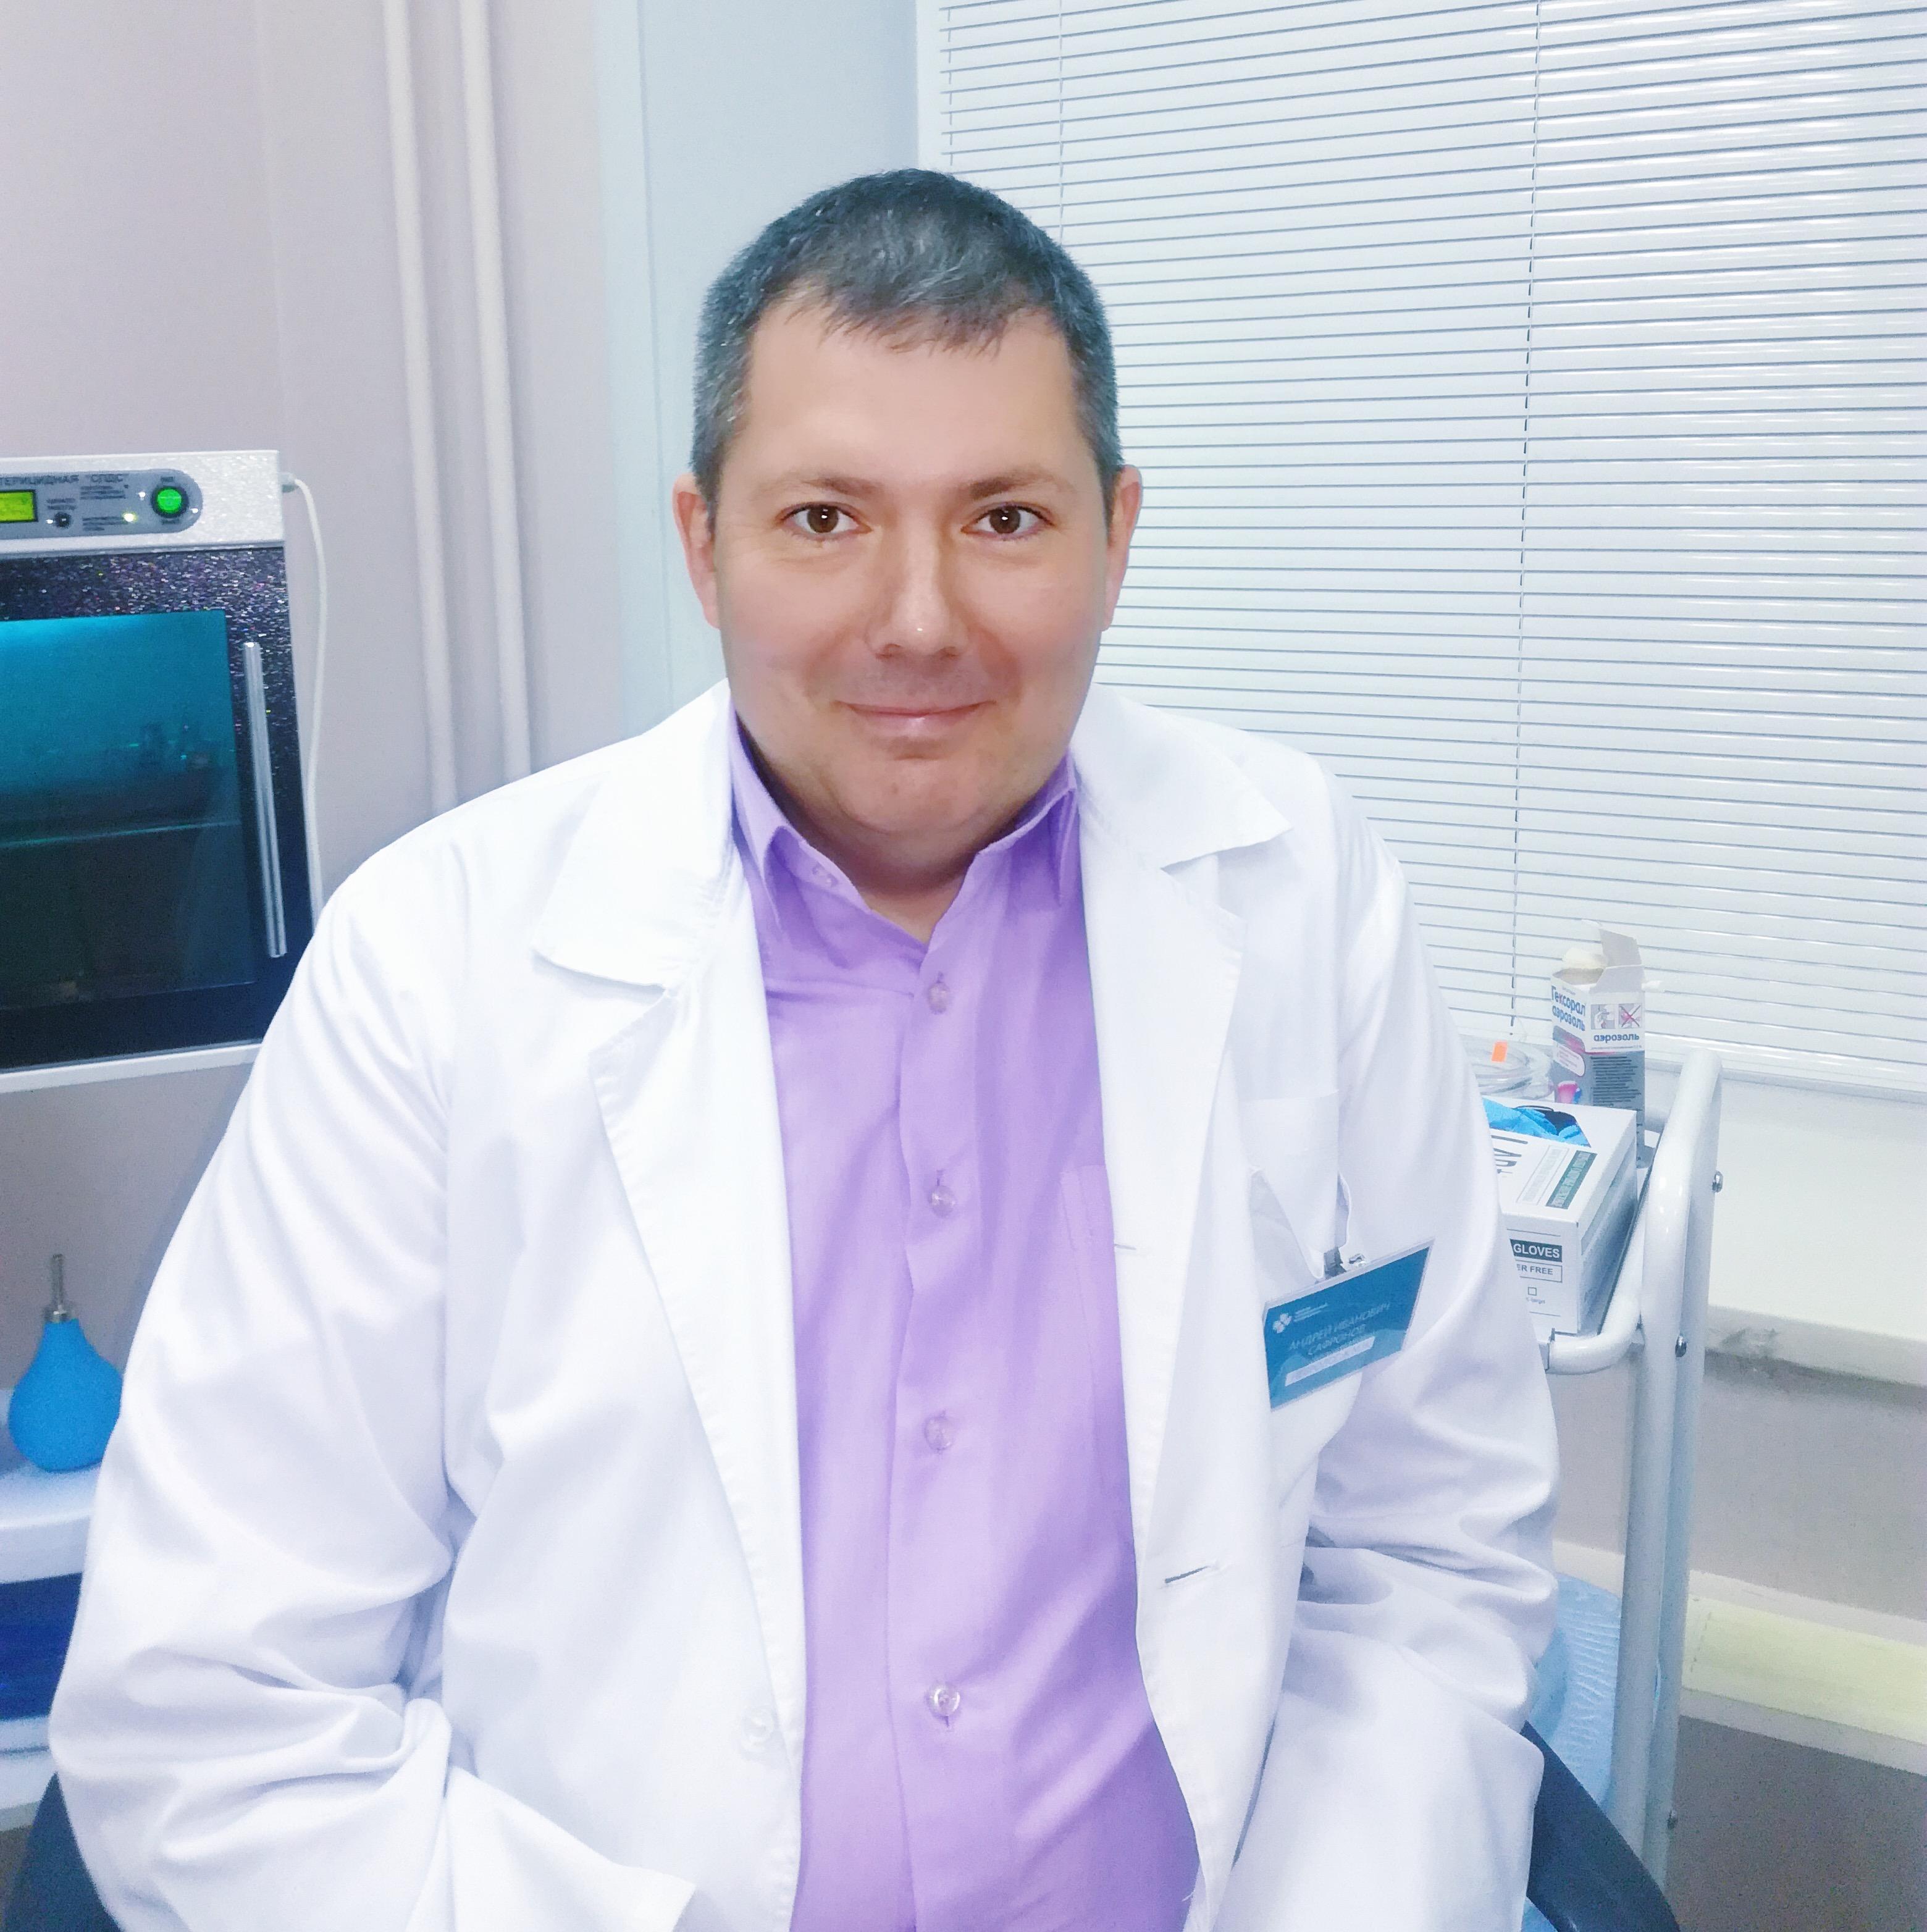 Сафронов невролог